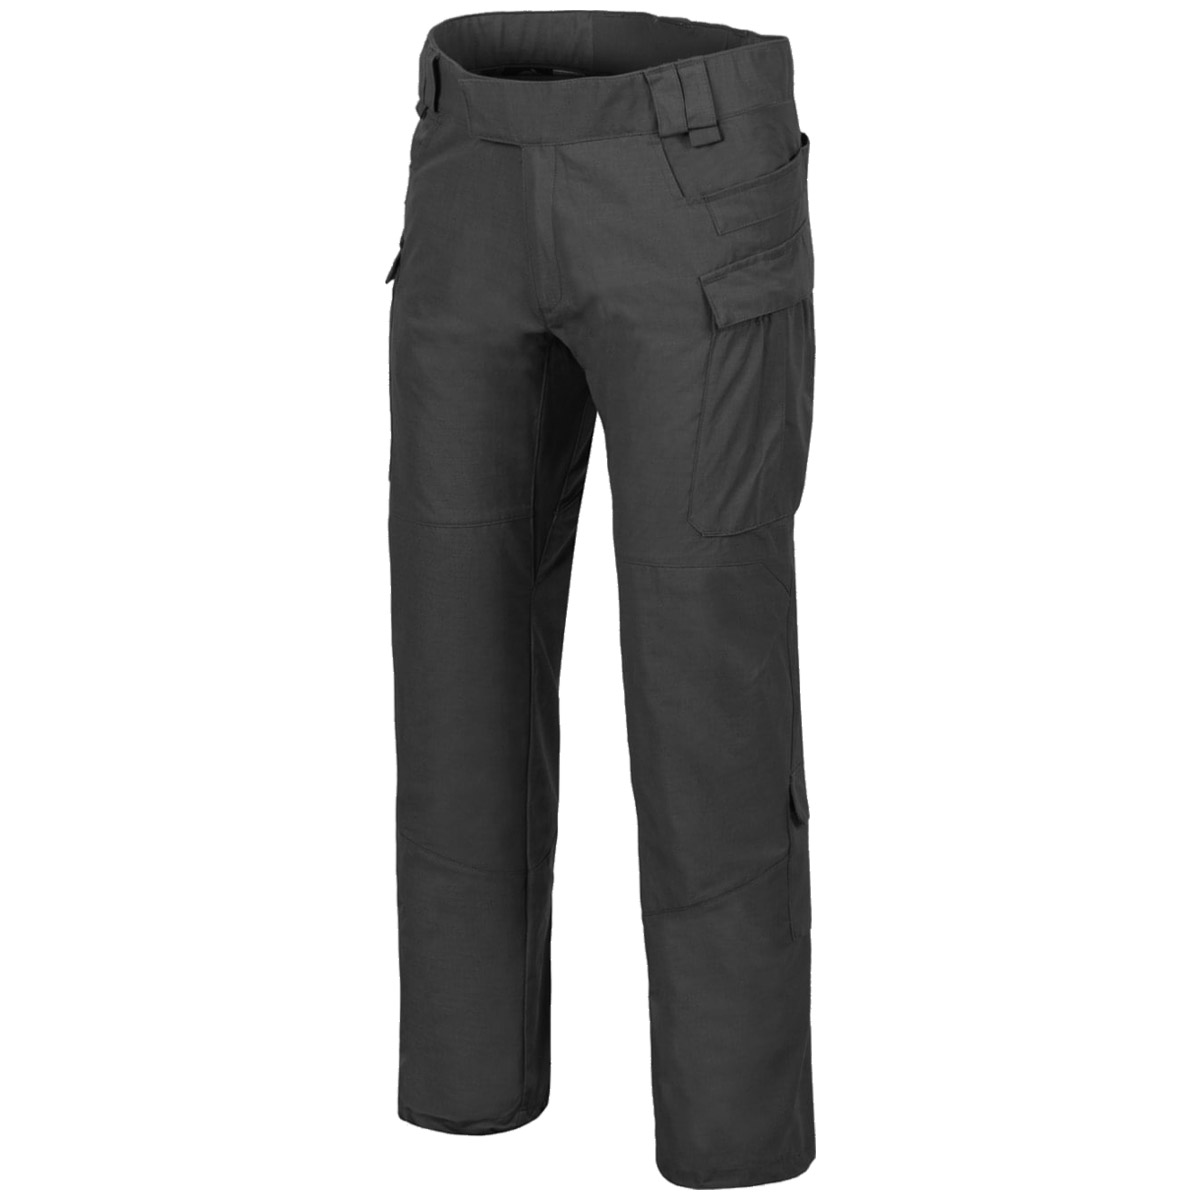 Helikon MBDU Trousers Mens Combat Pants Tactical Cargos Security Military Black